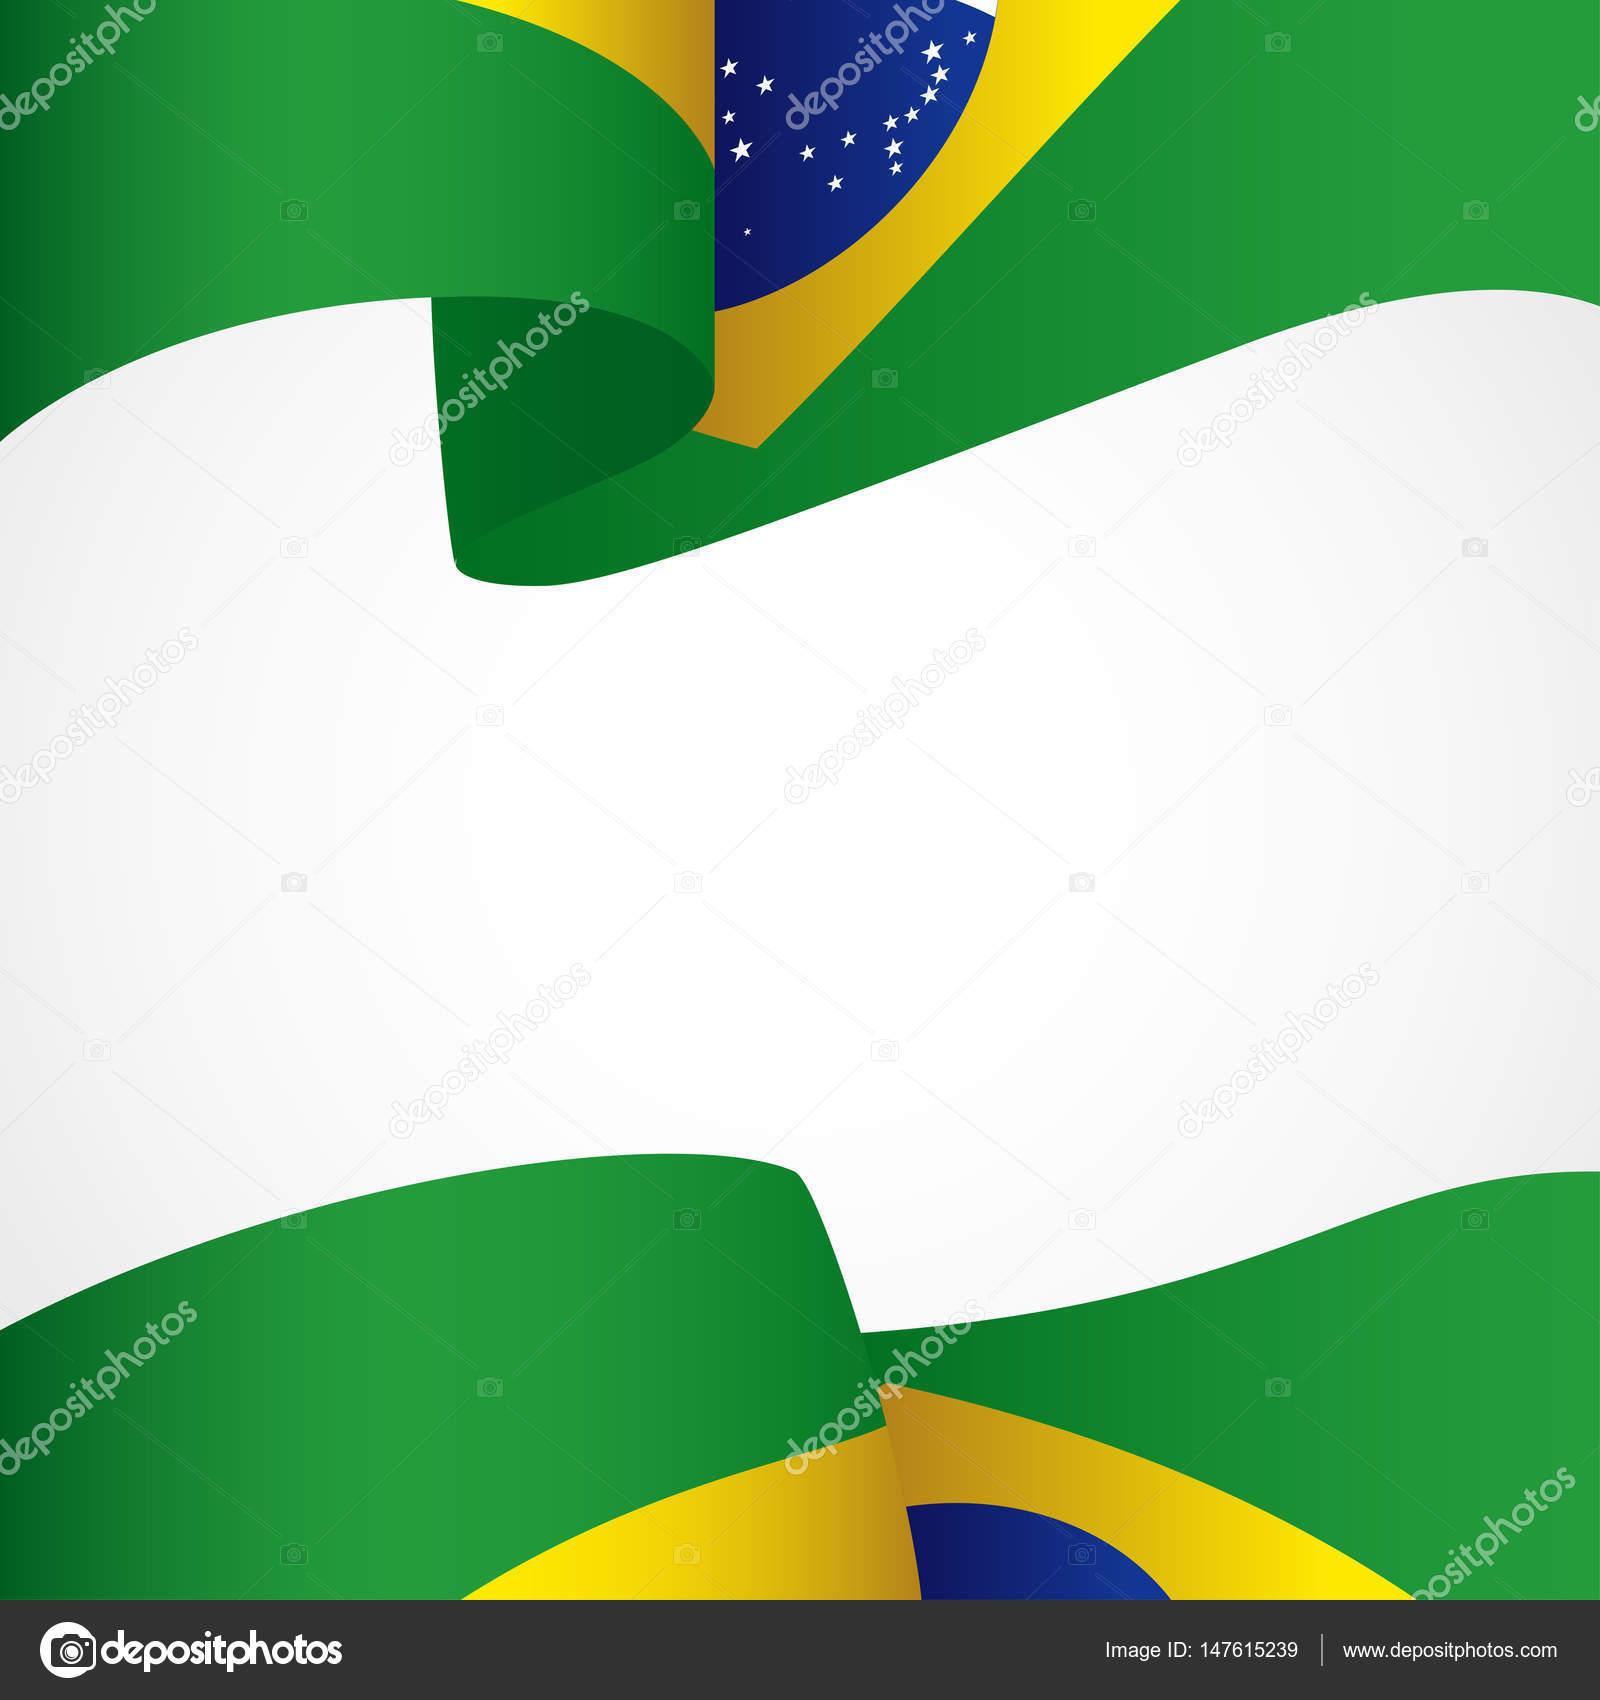 Brasilianische Dekoration dekoration des brasilien-insignia — stockvektor © rudall30 #147615239